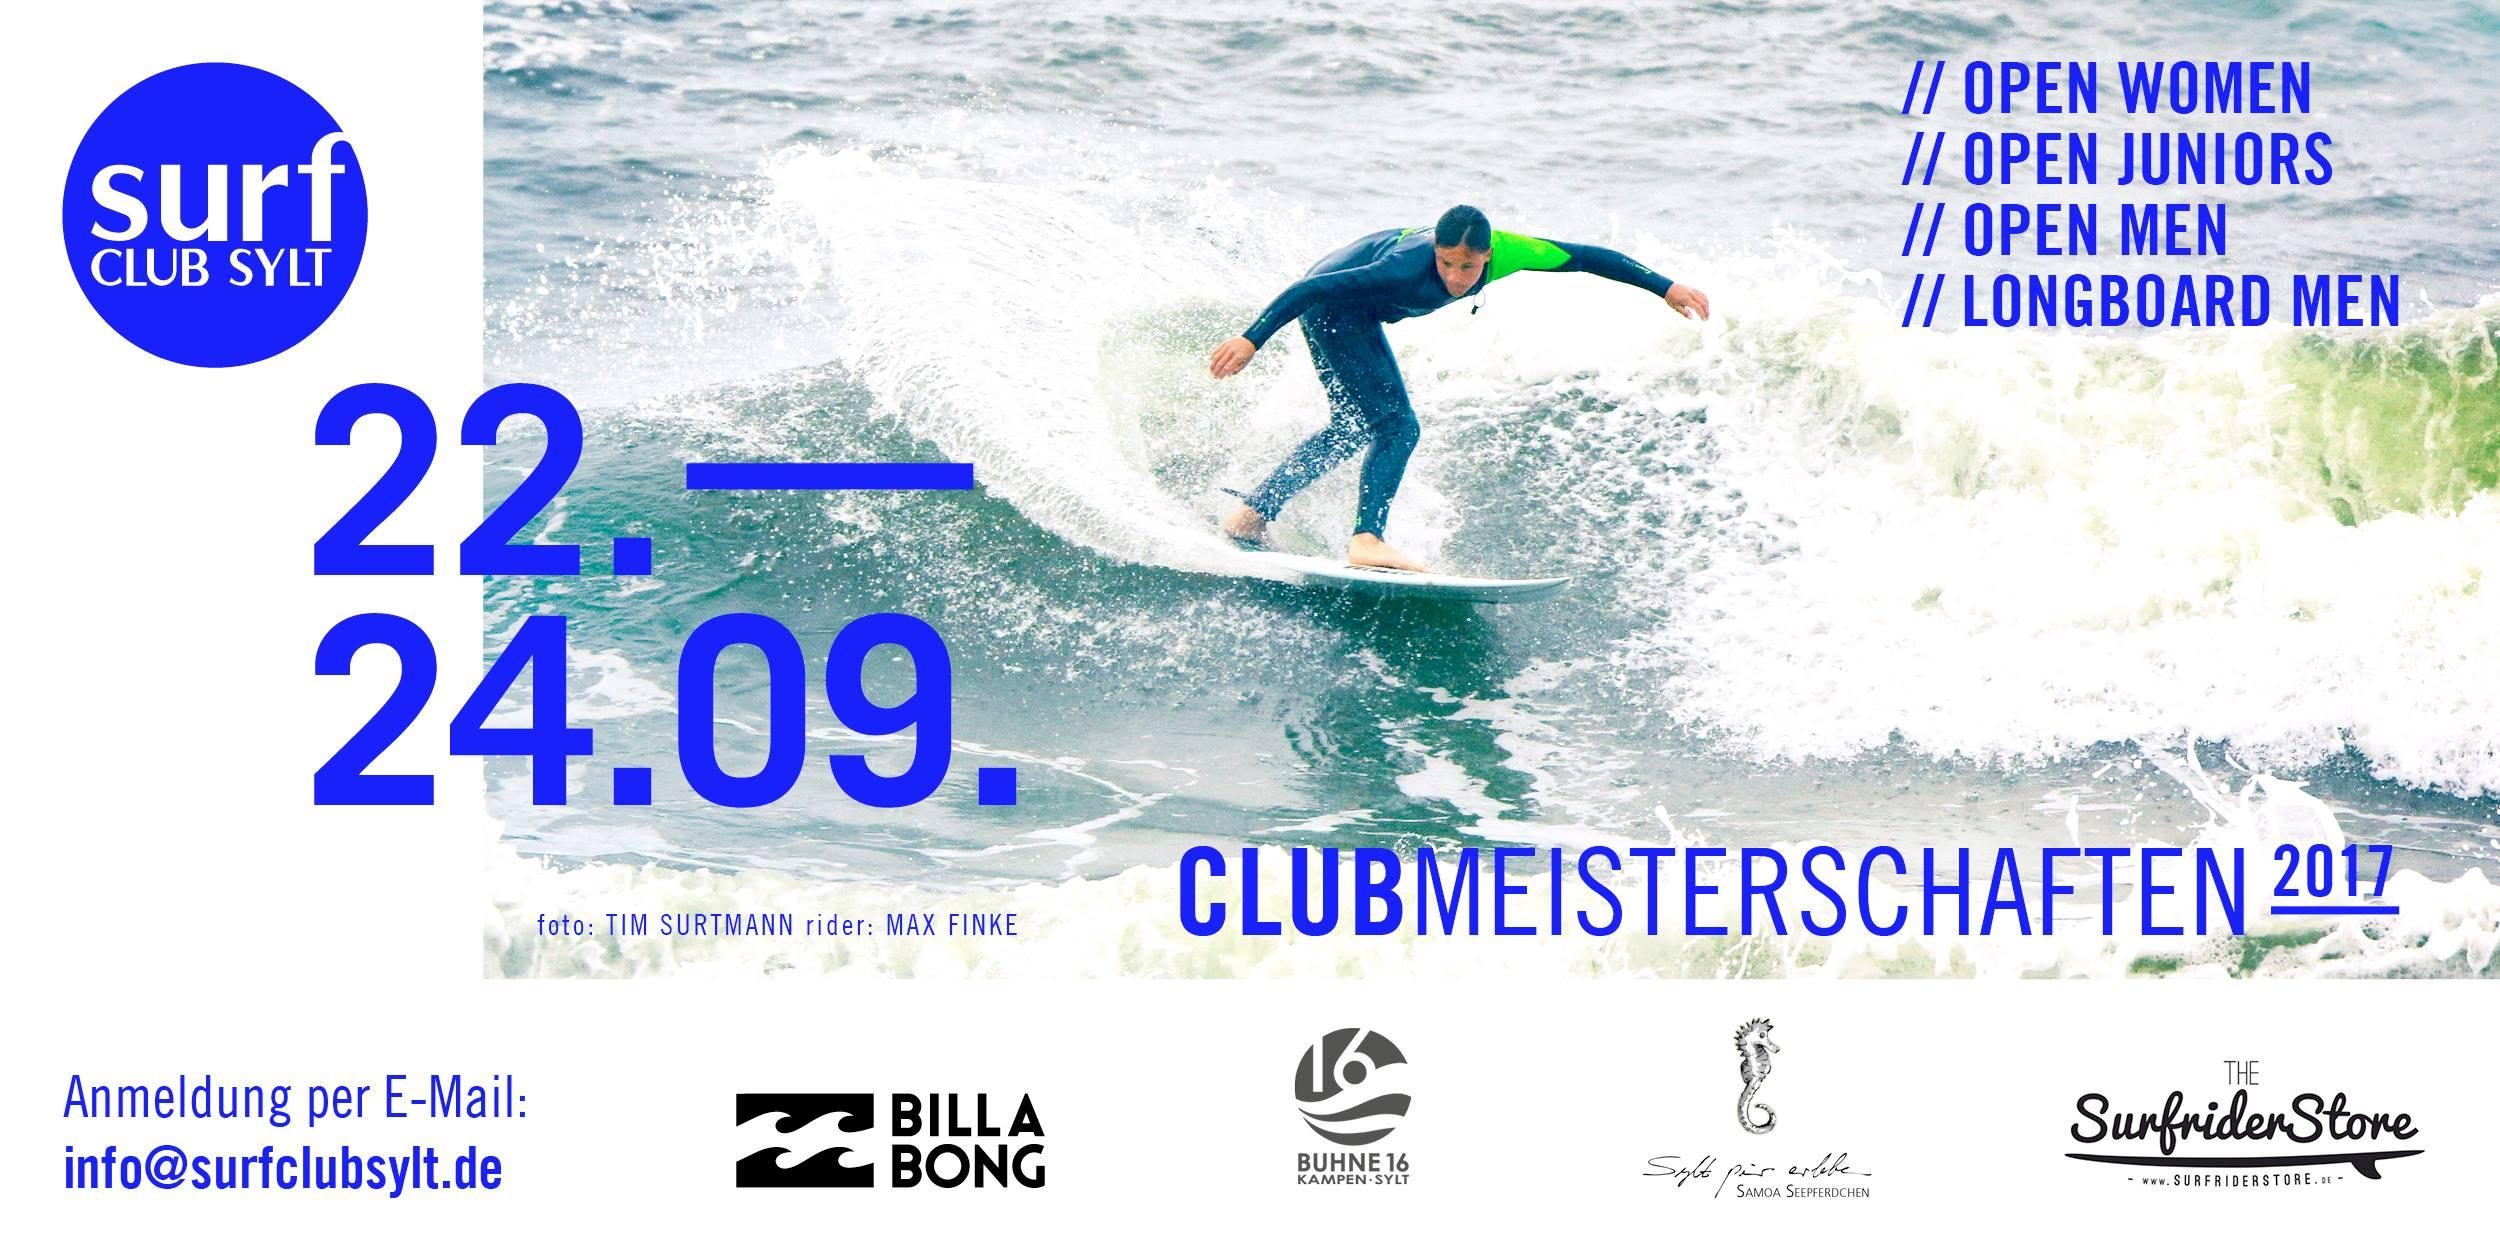 scs-clubcontest-sylt-surf.jpg